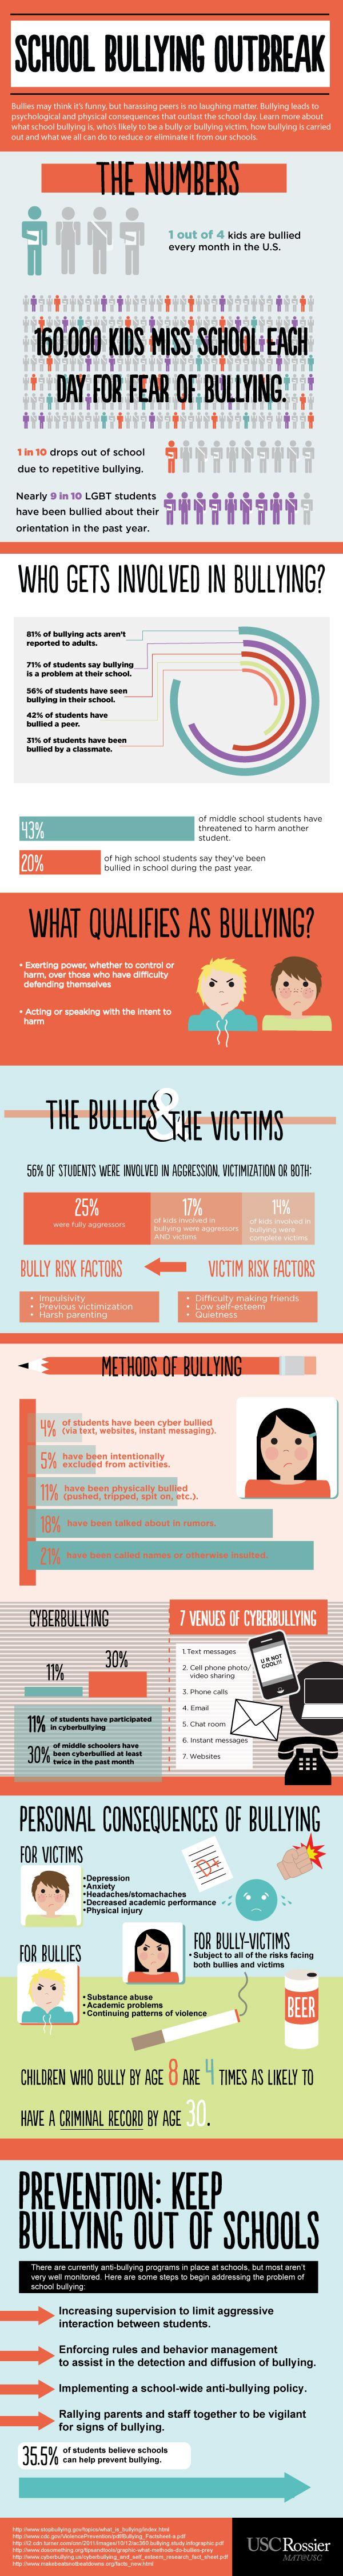 School Bullying Graphic